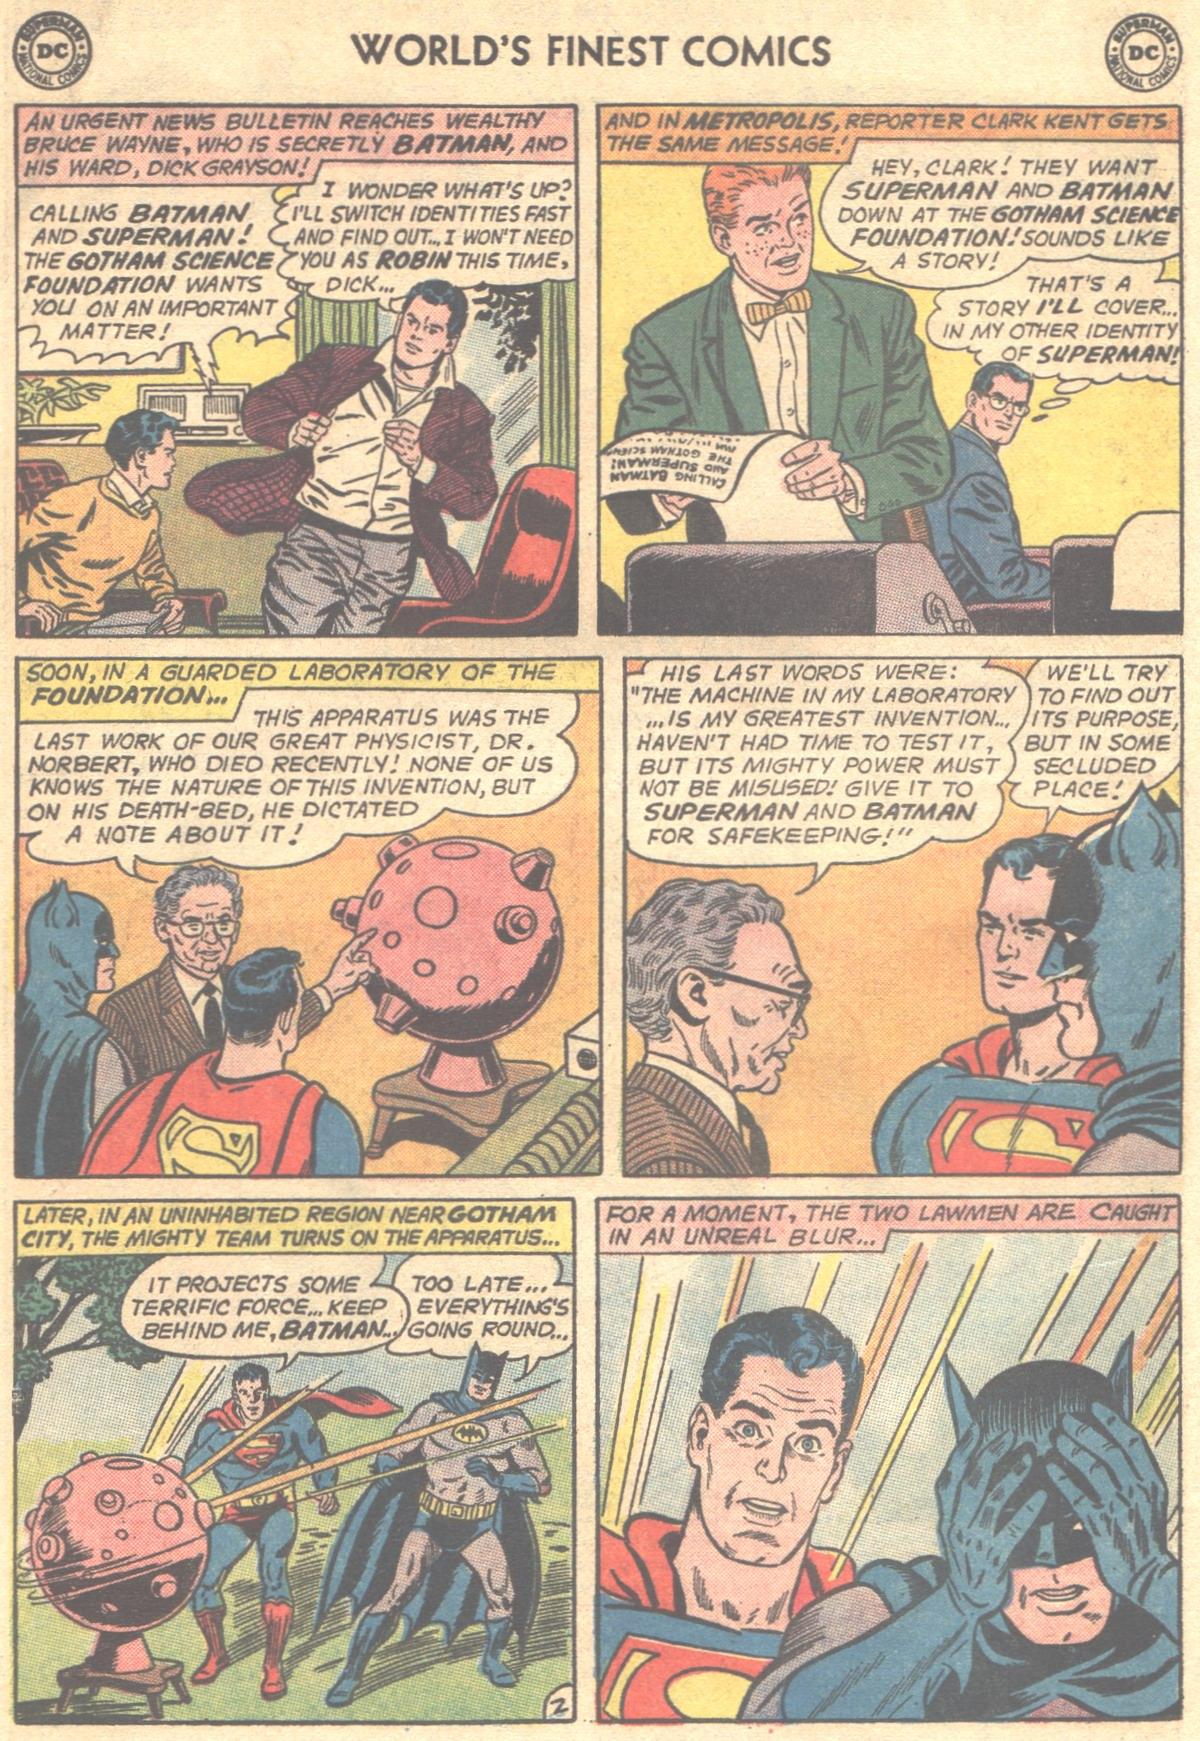 Read online World's Finest Comics comic -  Issue #148 - 4